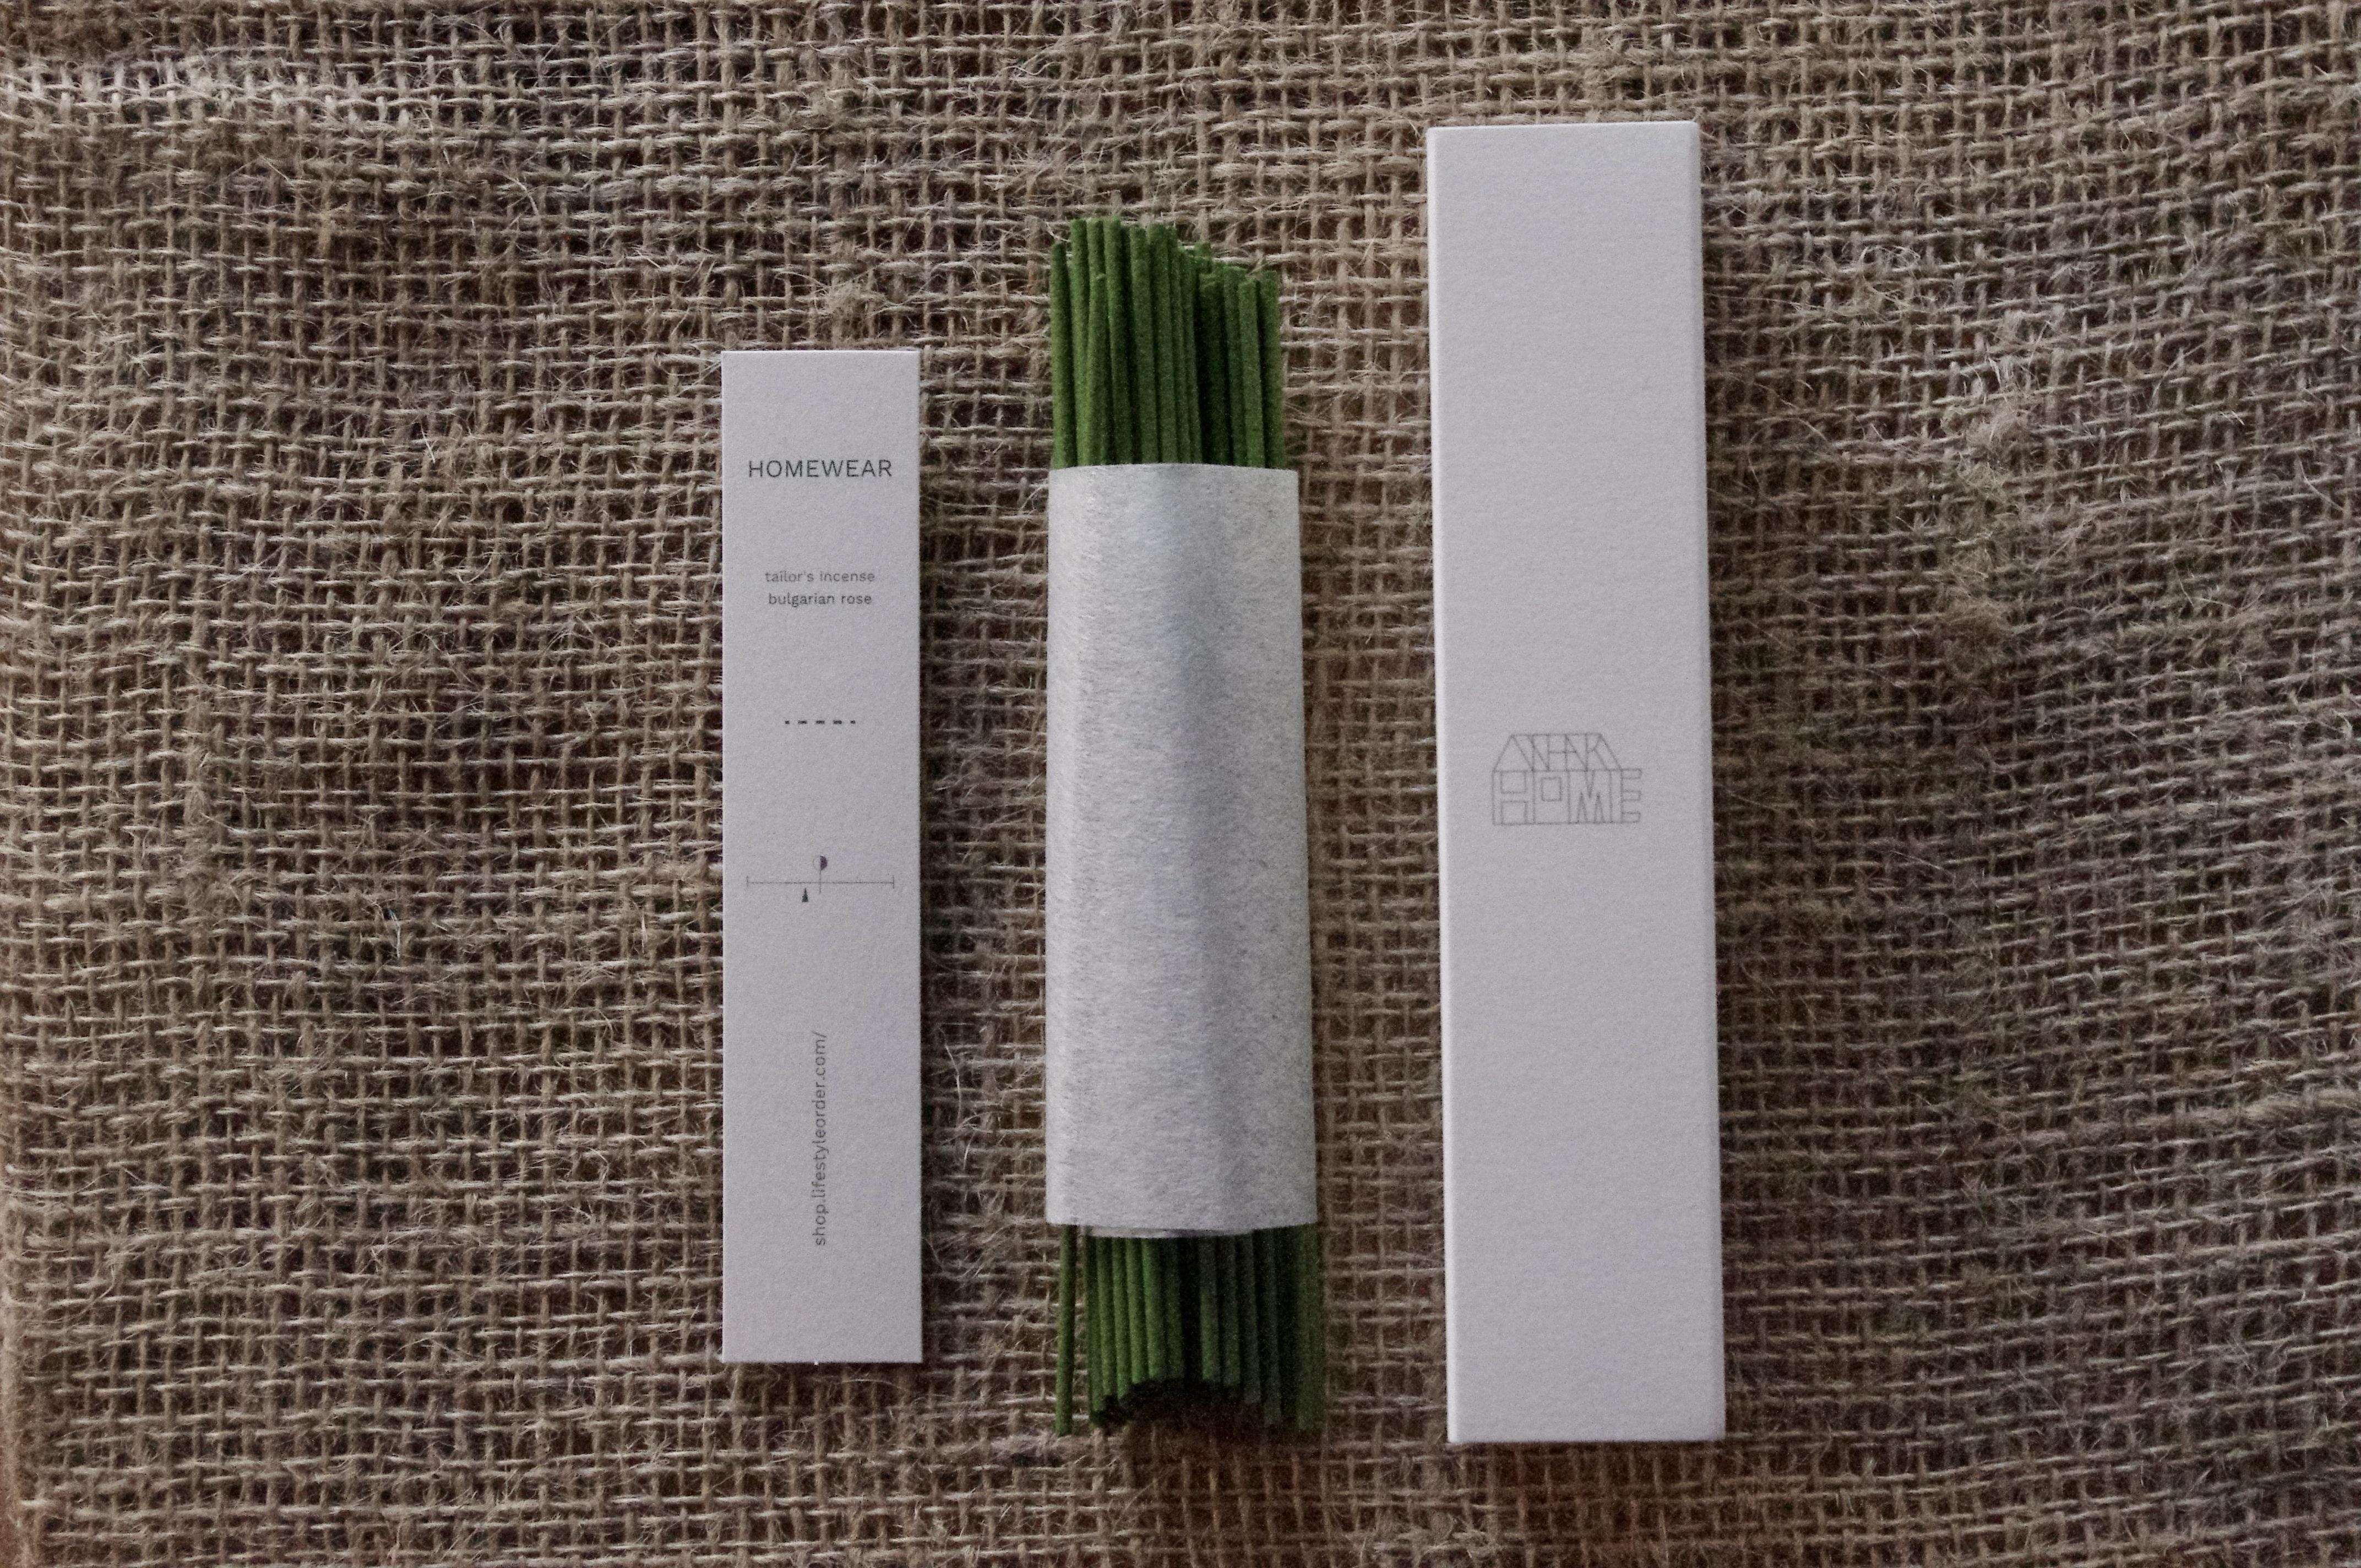 TIC001 - tailor's incense (線香)